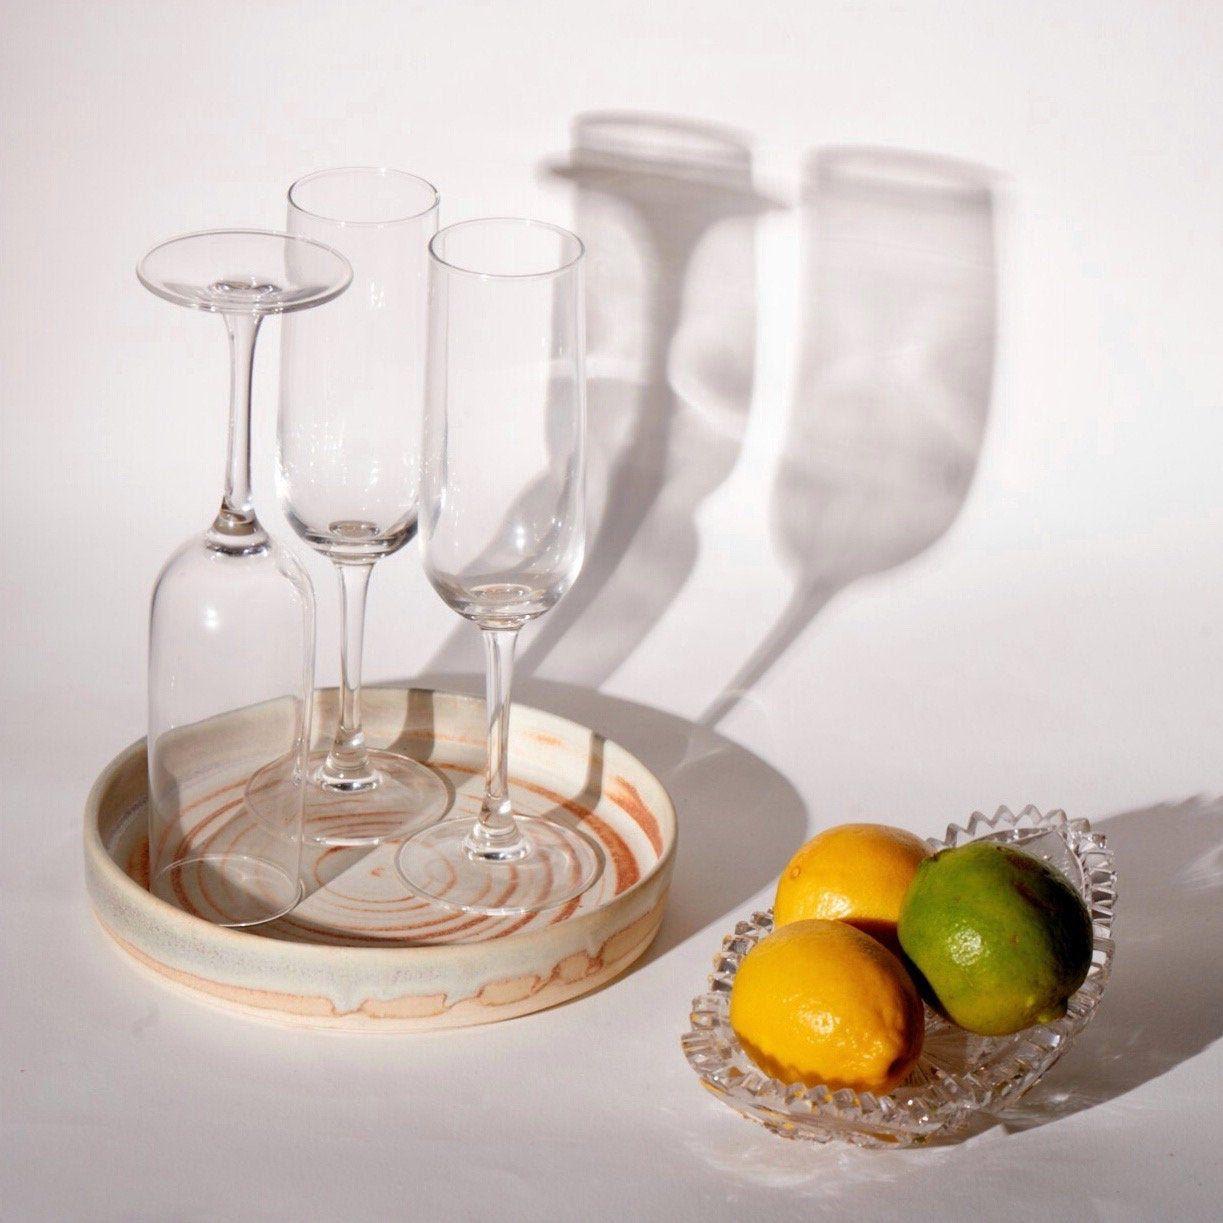 Serving Plate . . #artisangifts #wheelthrown #drinkware #ceramicplate #handmadeceramic #servingtray #handmade